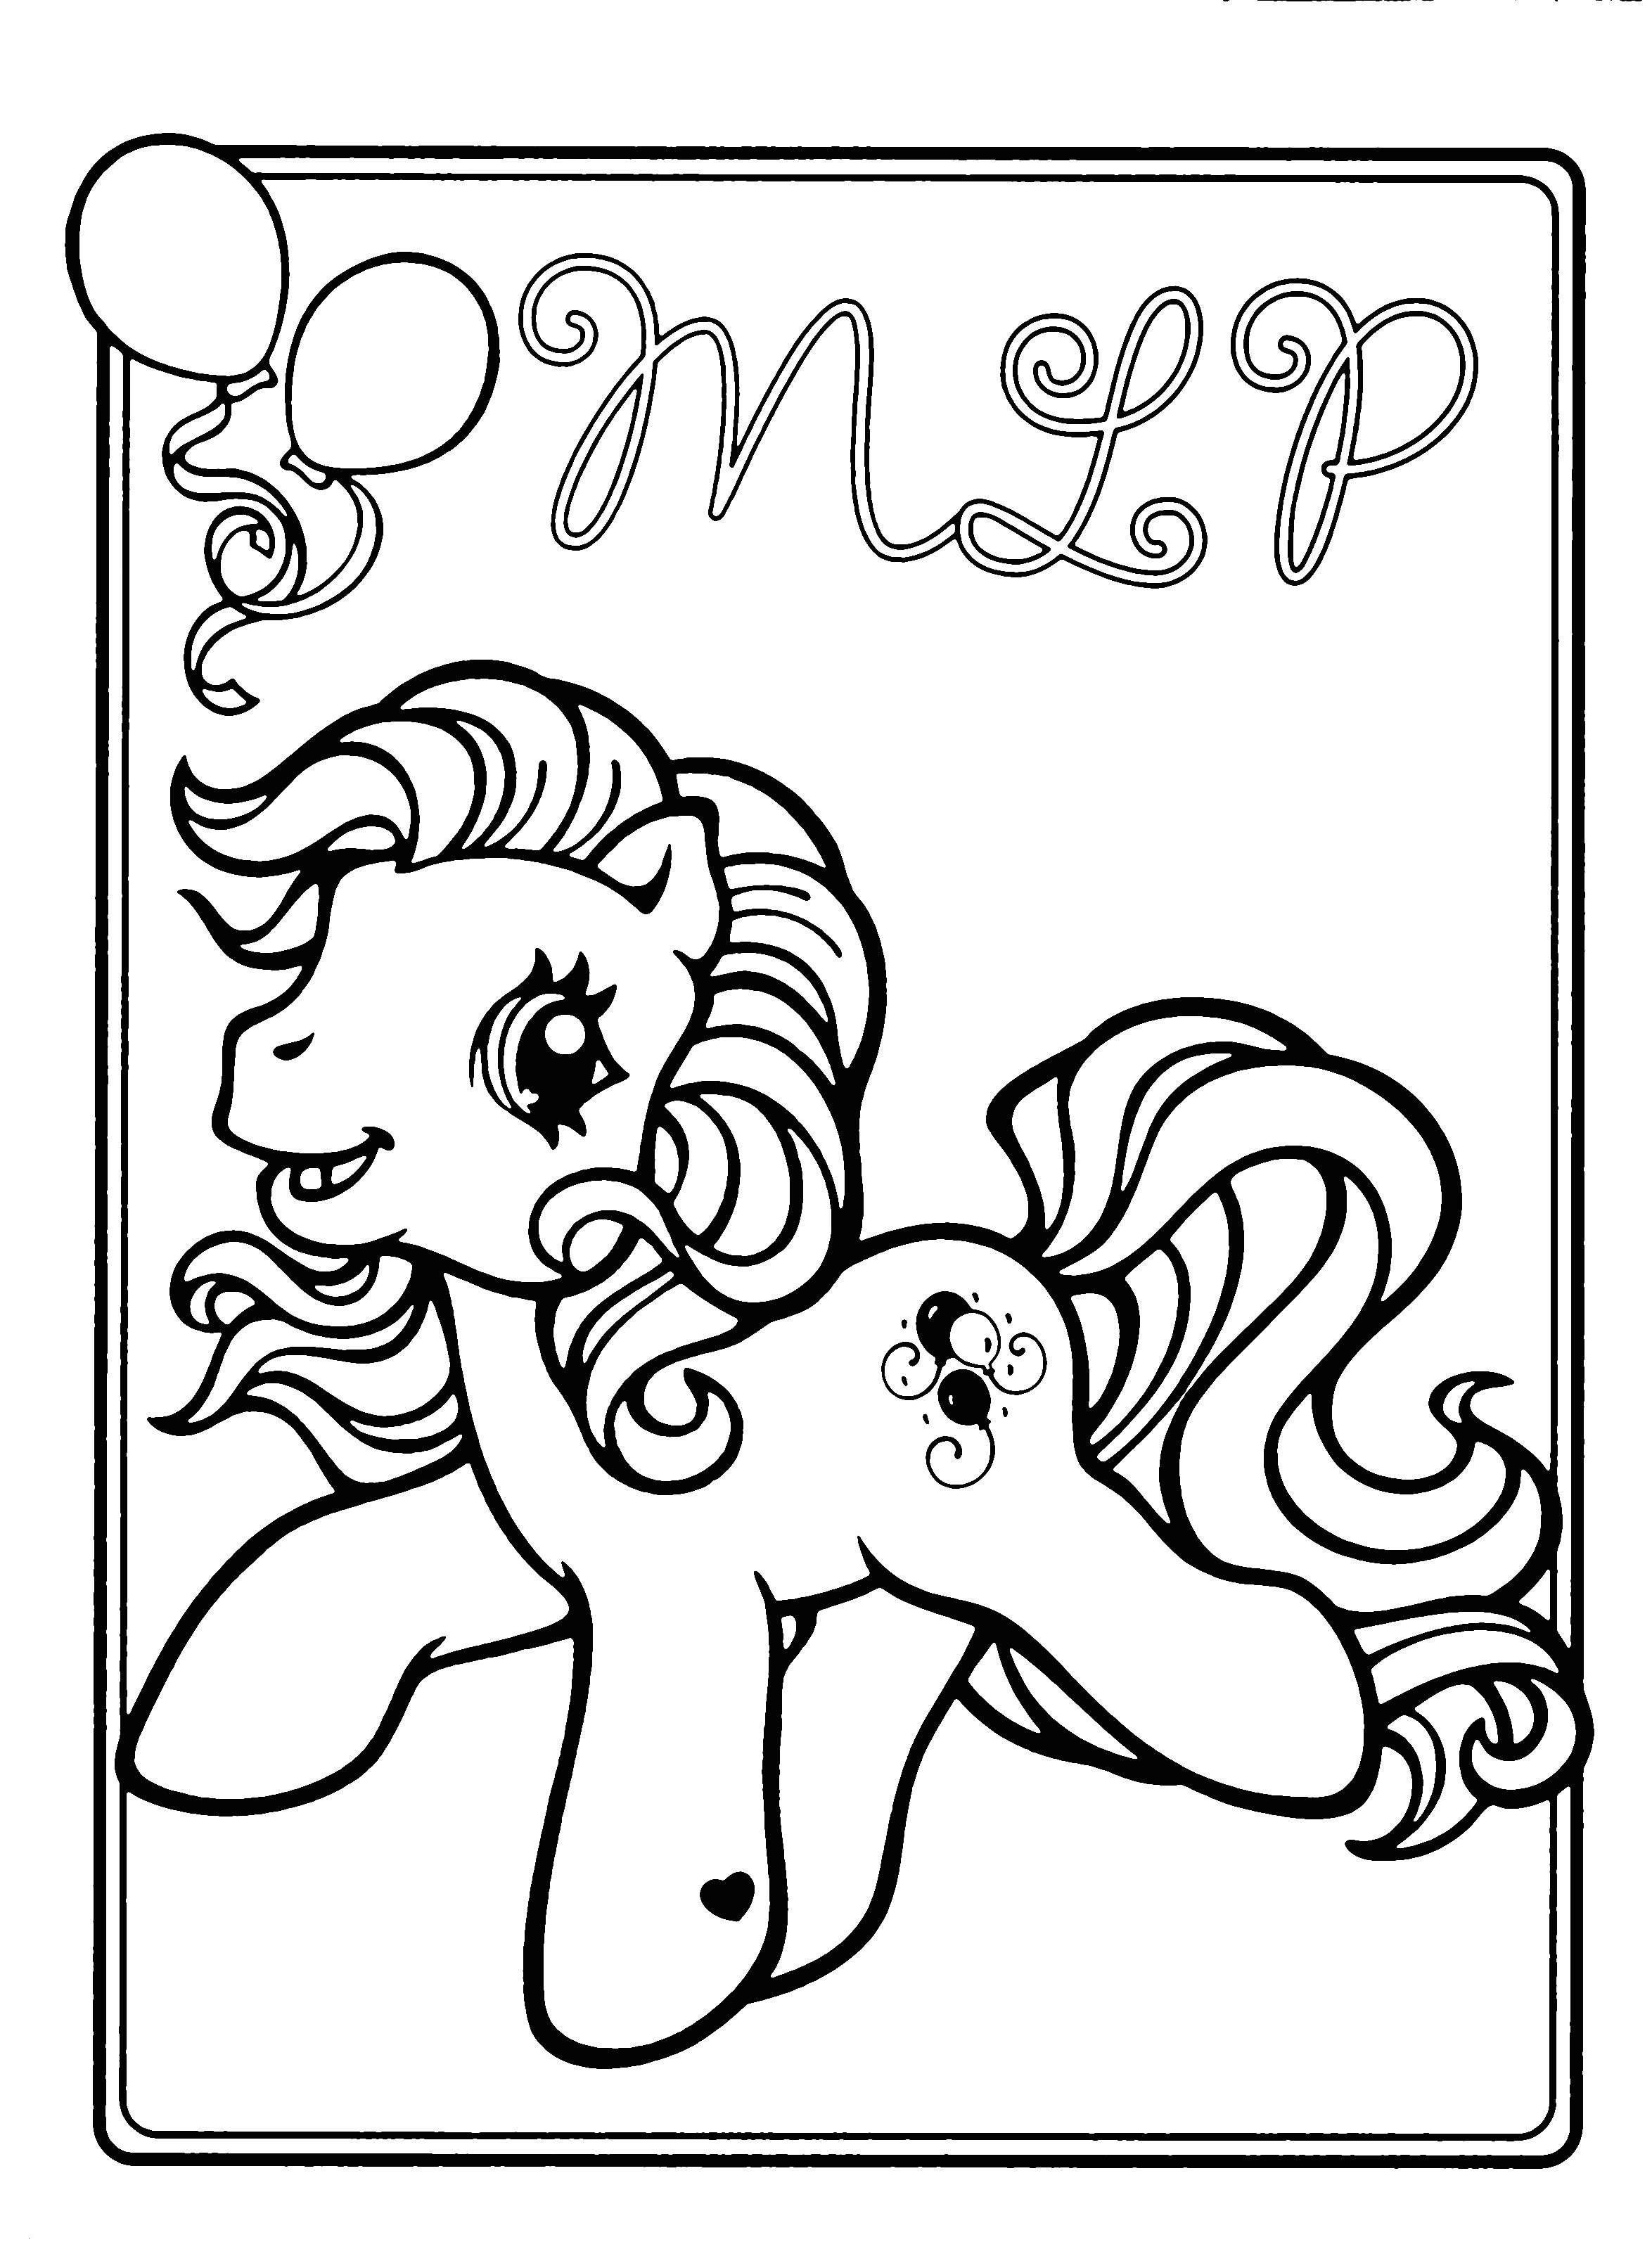 Soy Luna Ausmalbilder Neu Equestria Girls the Other Side Archives forstergallery Bild